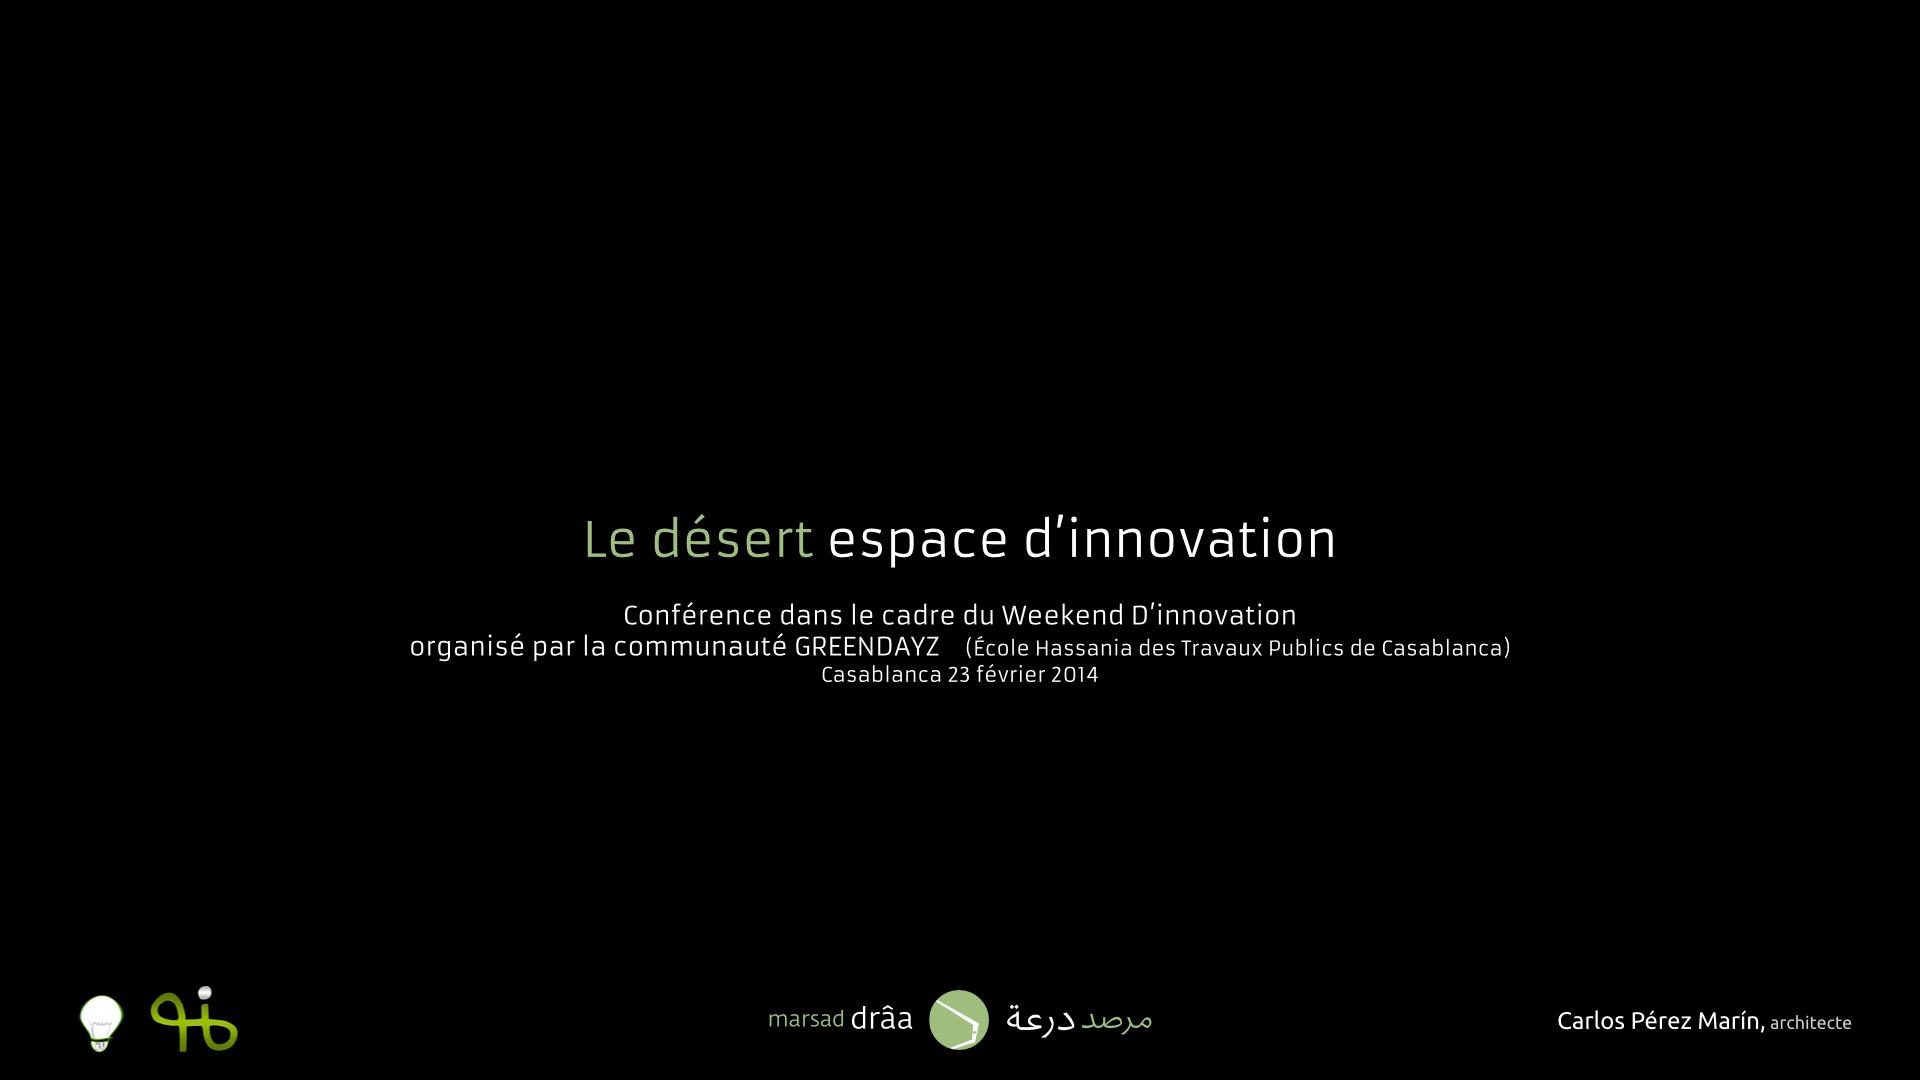 LE DESERT ESPACE D'INNOVATION, Casablanca (Maroc) 2014